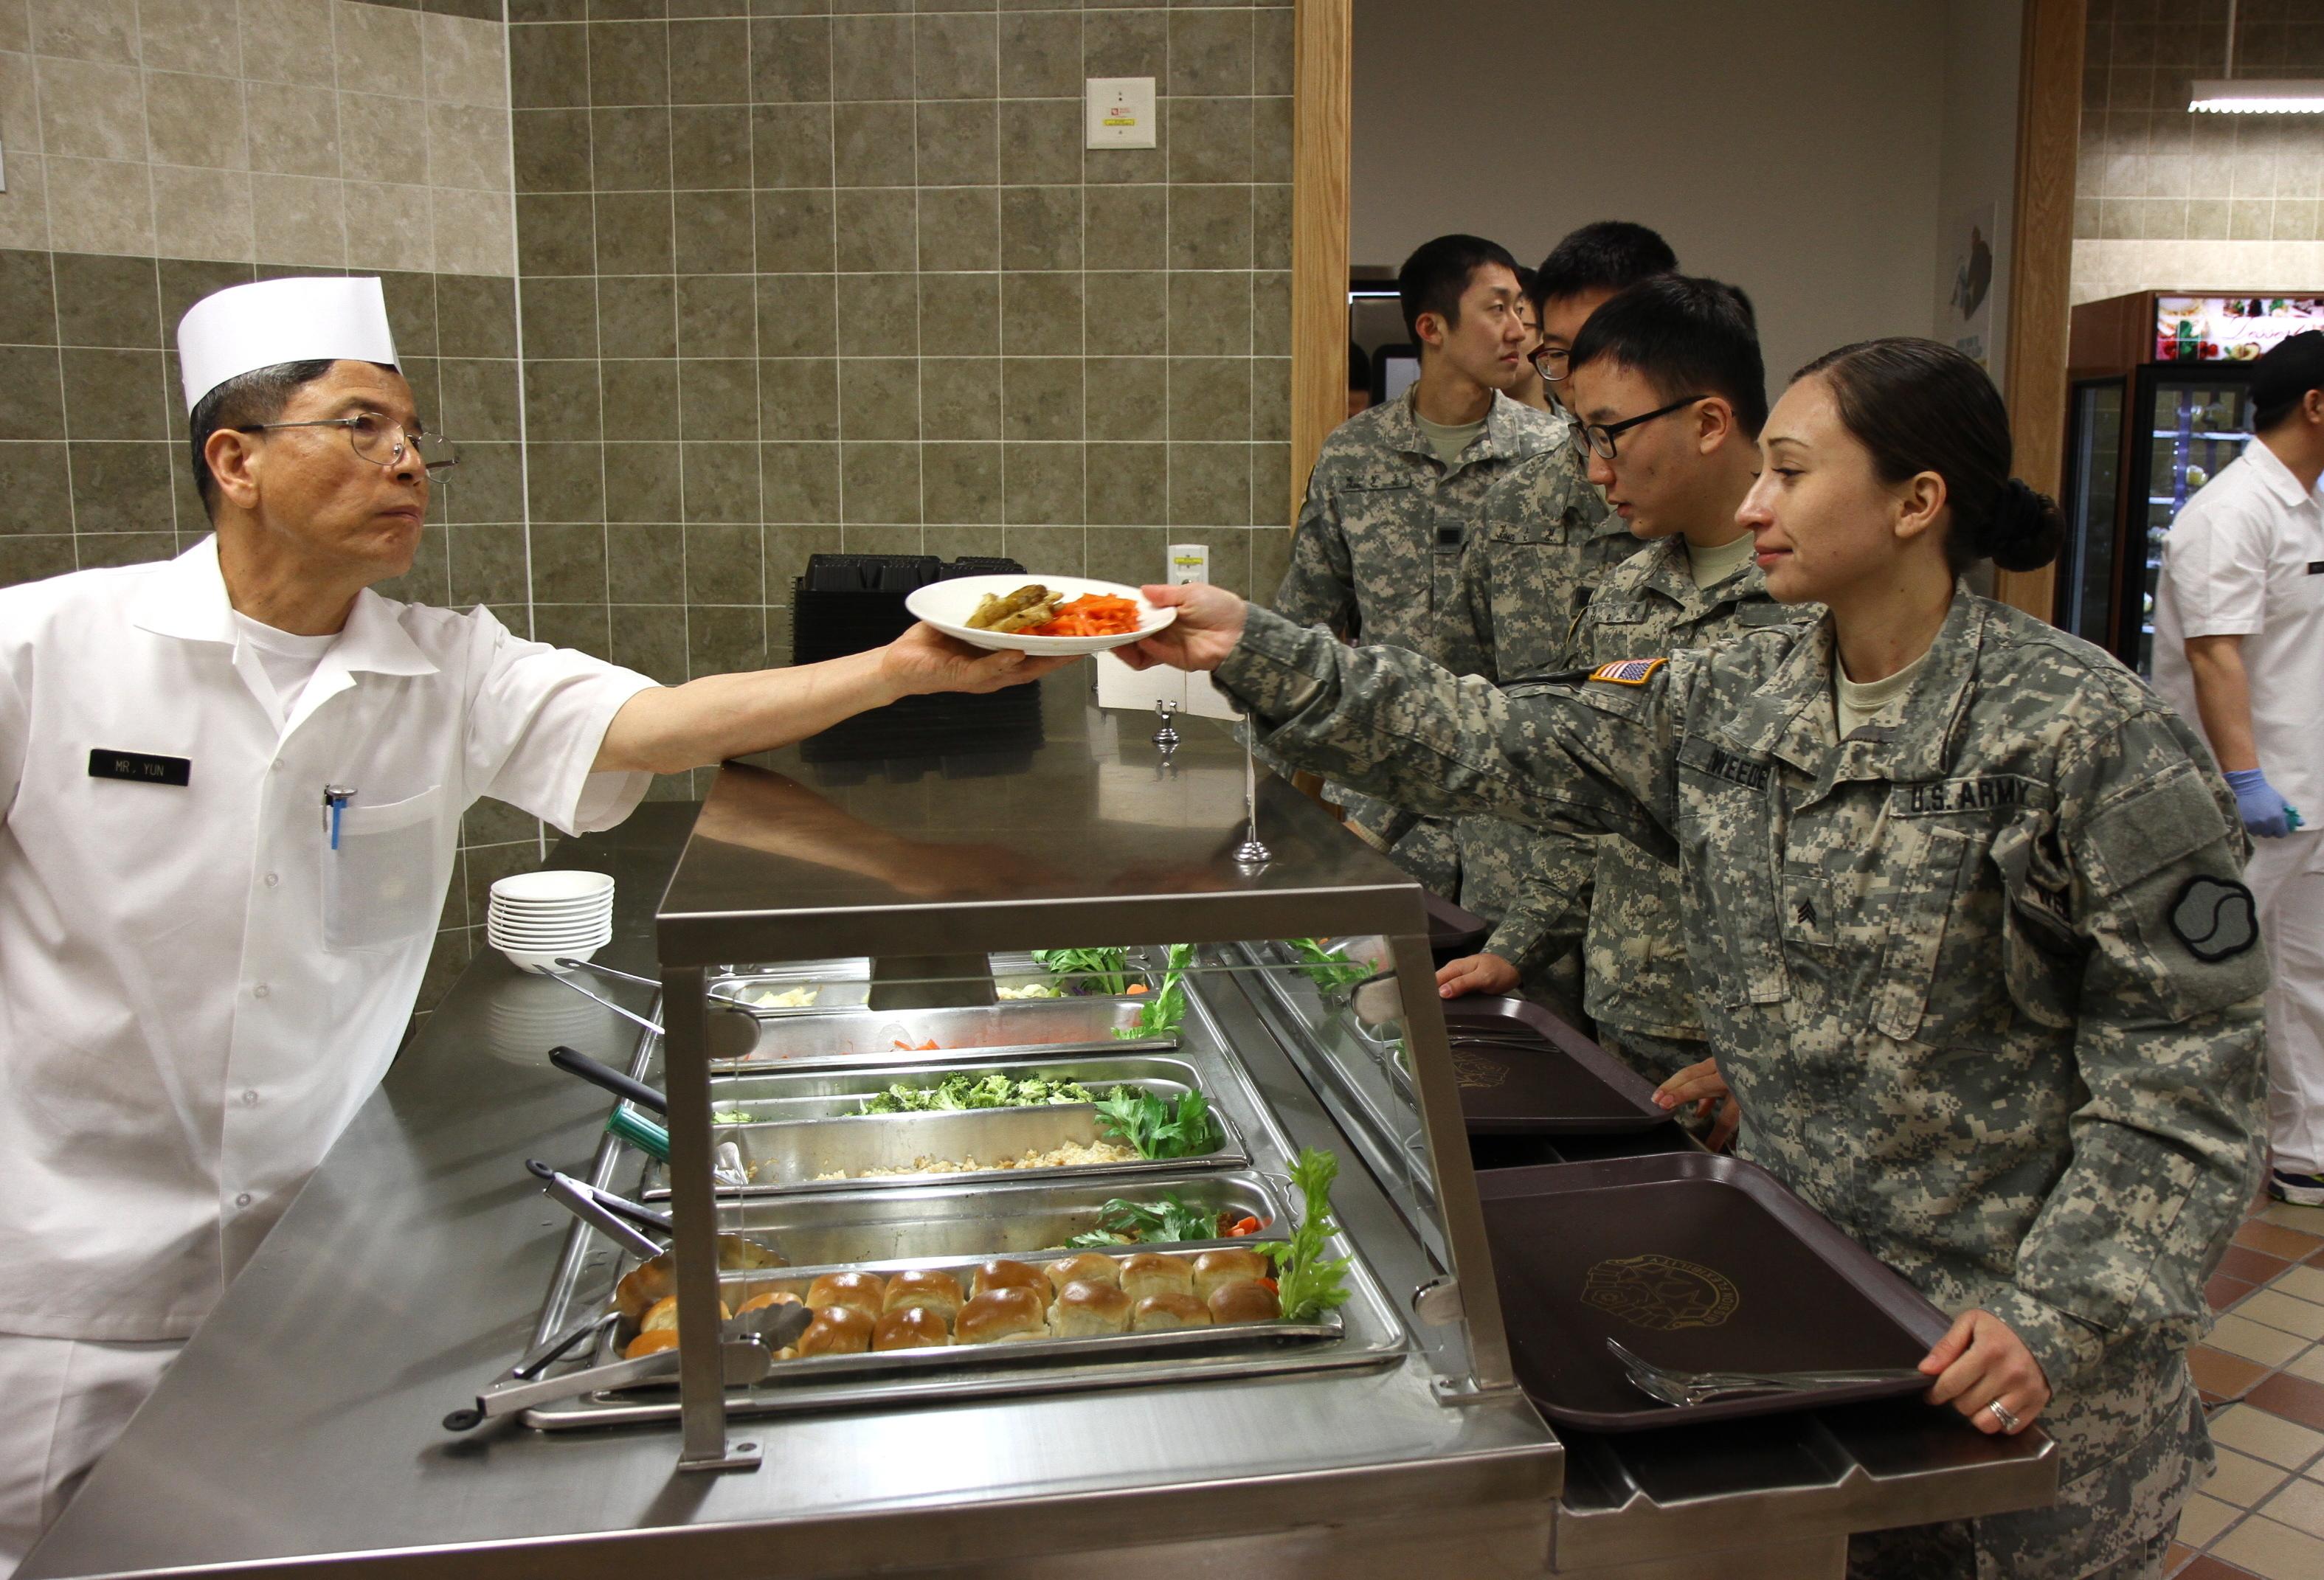 New Army Food Service Uniform